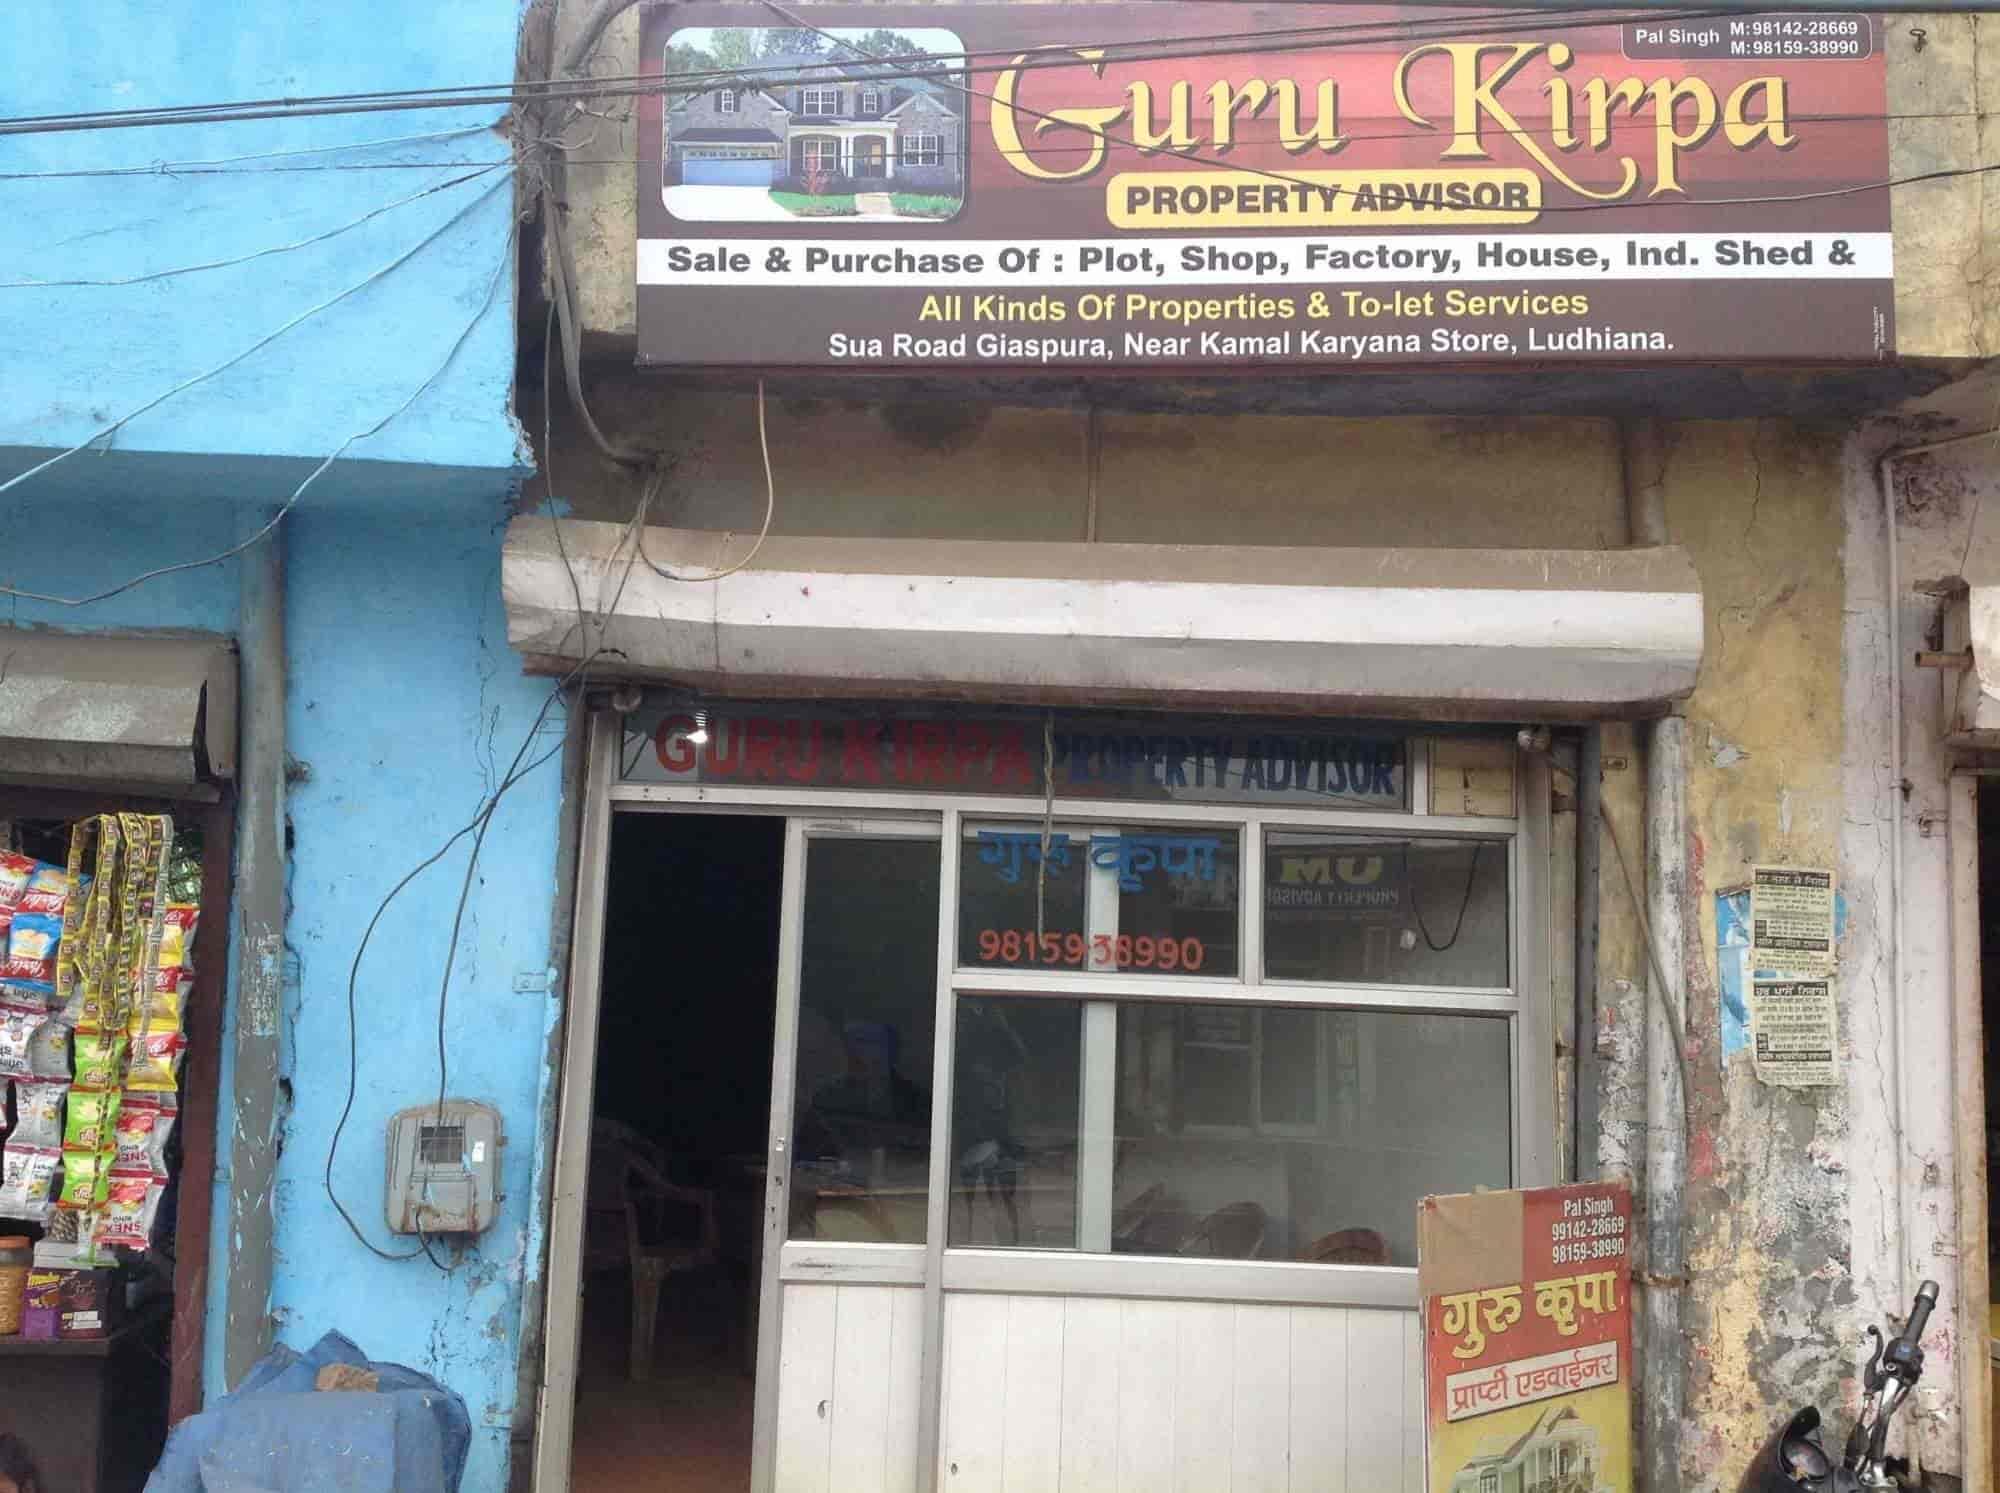 Garg & Co Property Advisor, Jaspal Bangar - Estate Agents in